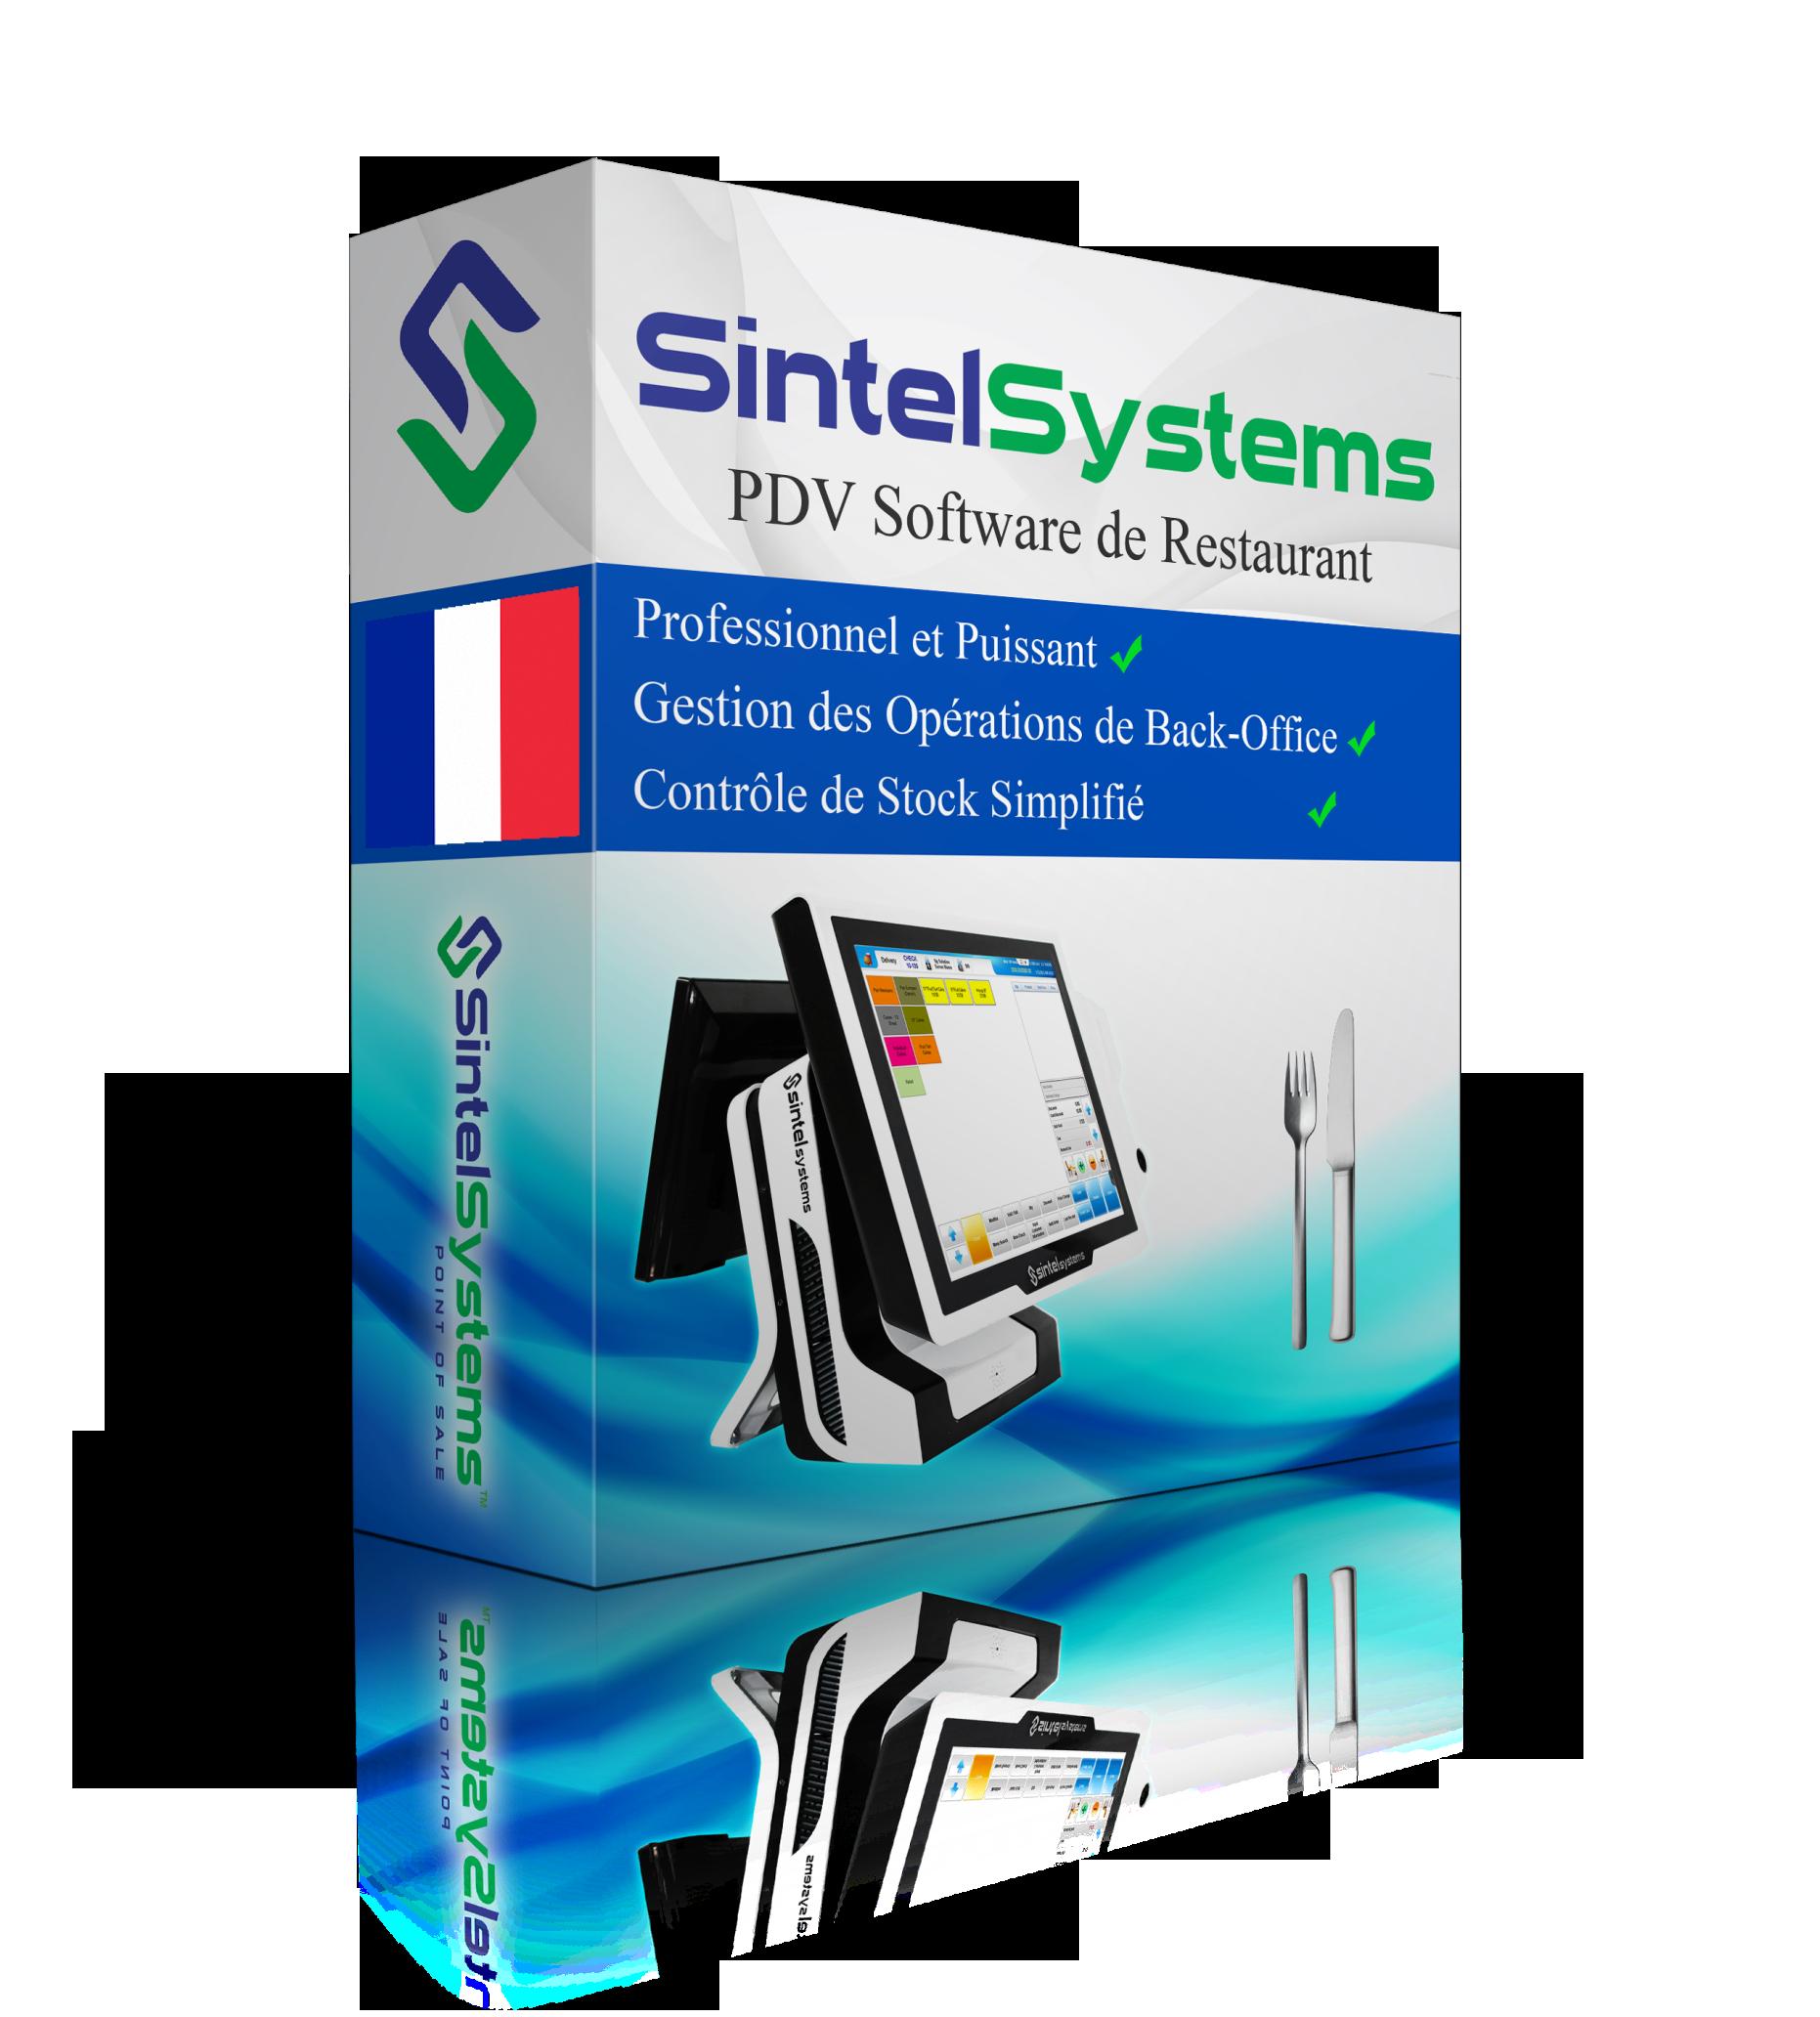 Français-Restaurant-PDV-Point-De-Vente-Logiciel-Software-Sintel-Systems-www.SintelSystemsPOS.com